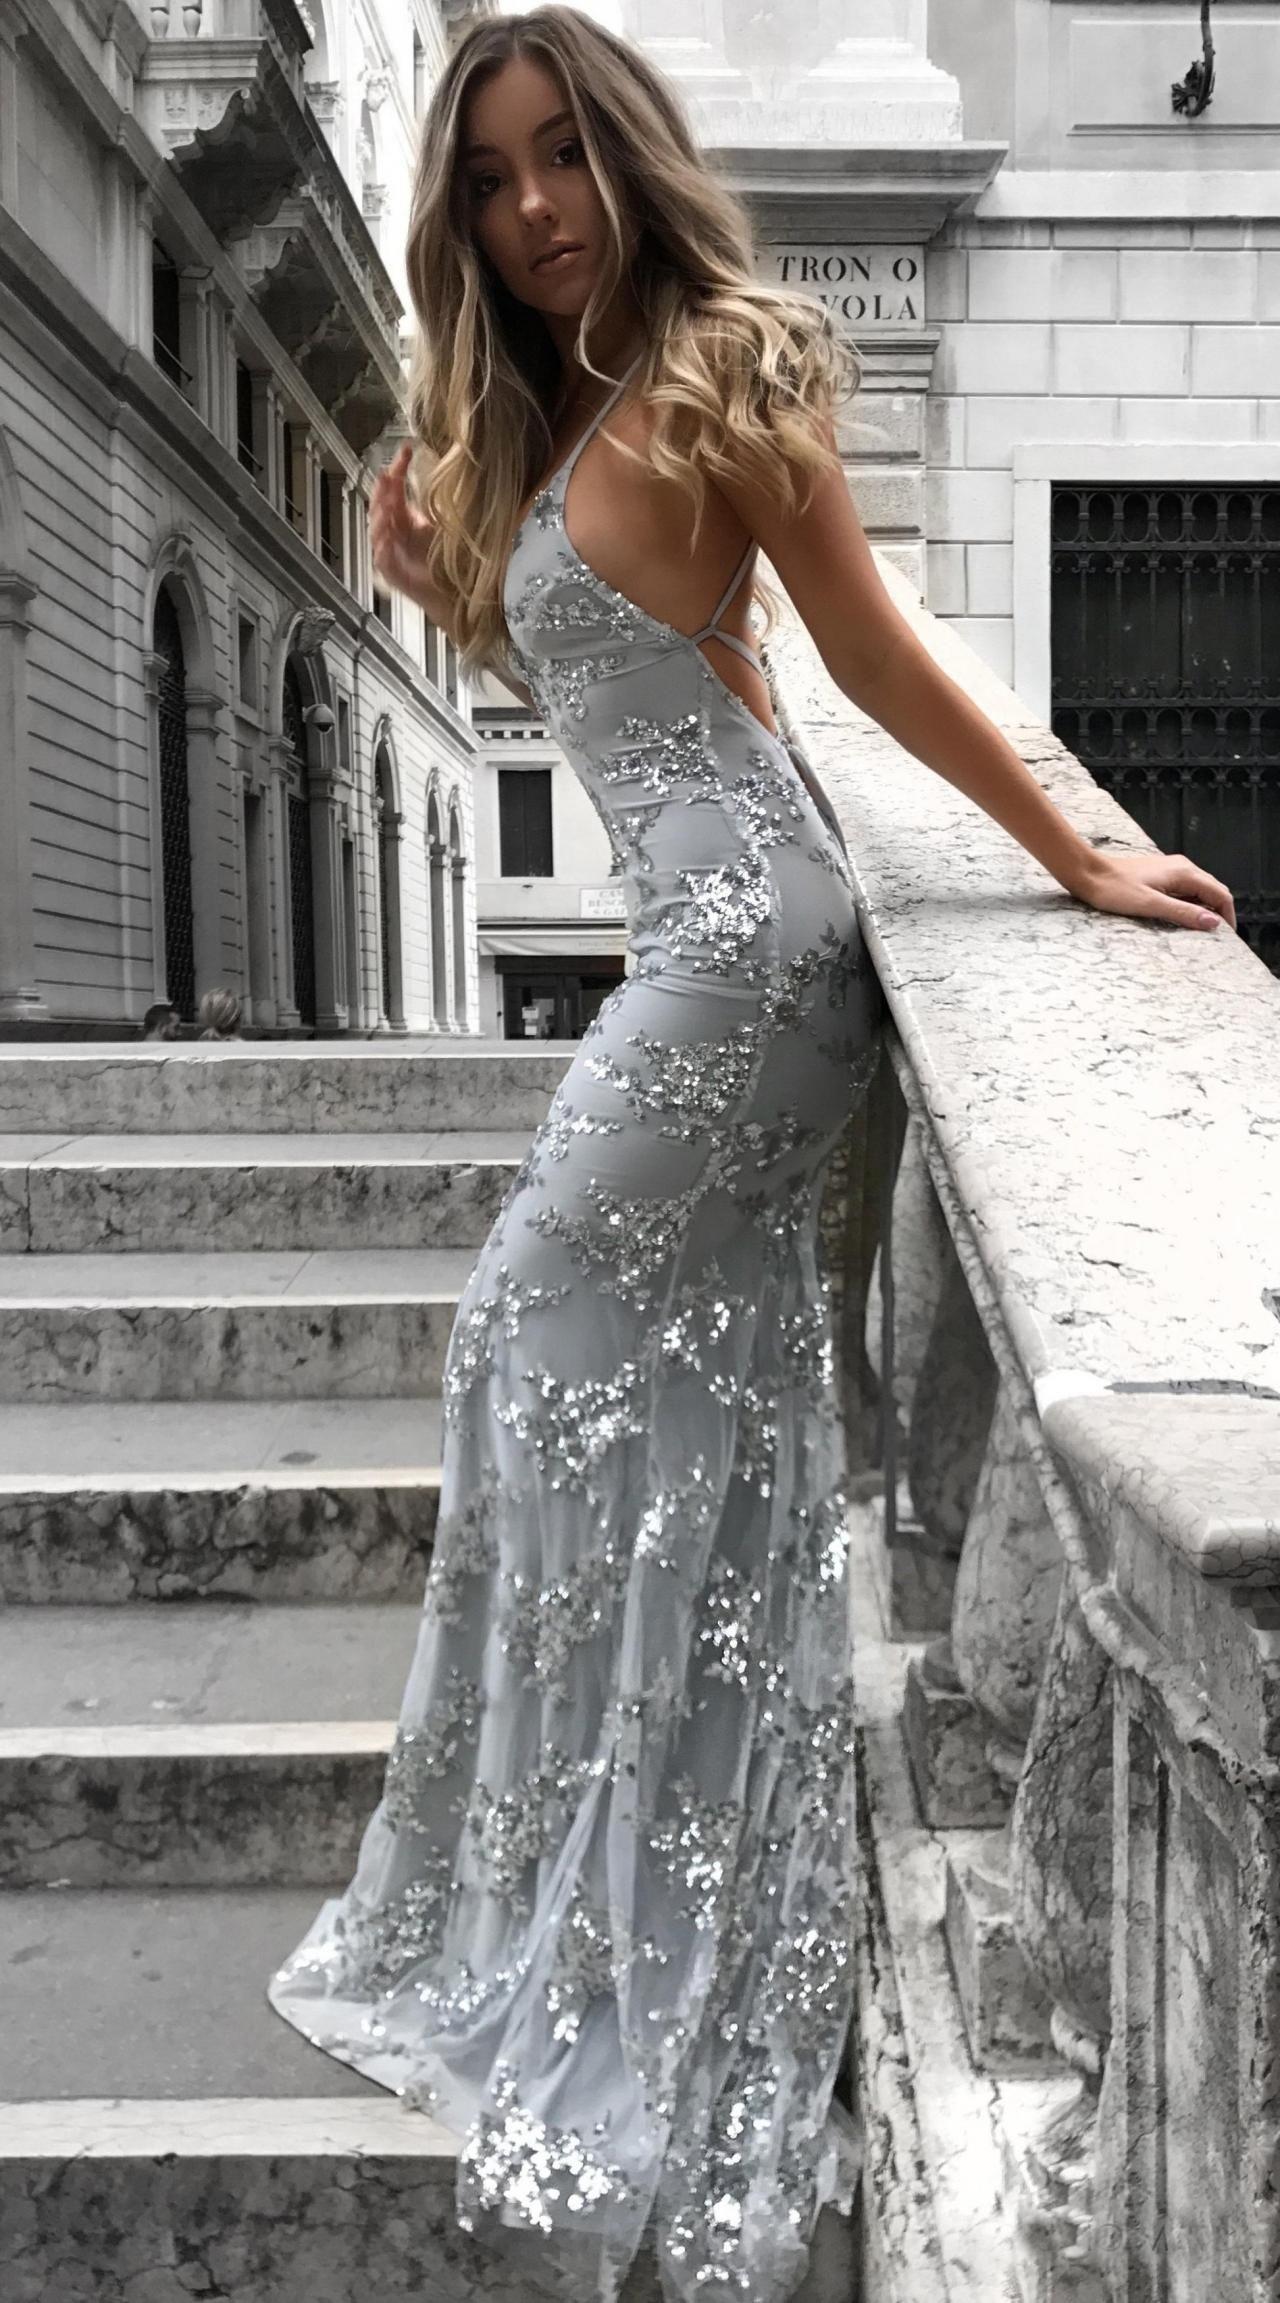 Designer Luxus Abendkleider Elegant Lang Günstig für 2019Abend Schön Abendkleider Elegant Lang Günstig Design